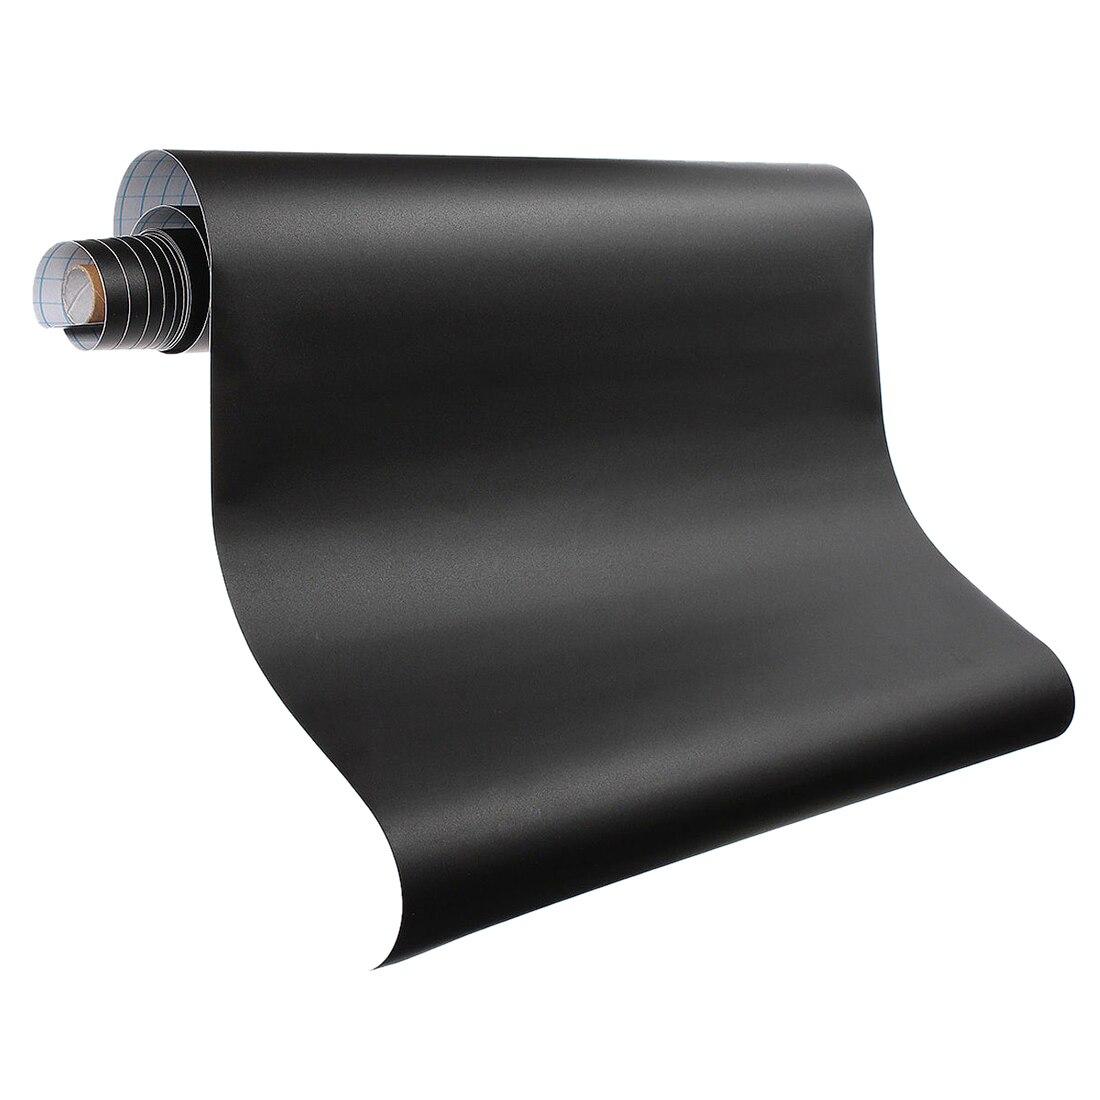 Blackboard-Decal Removable Peel-Stick School-Supply Office Vinyl 200x60cm JSES